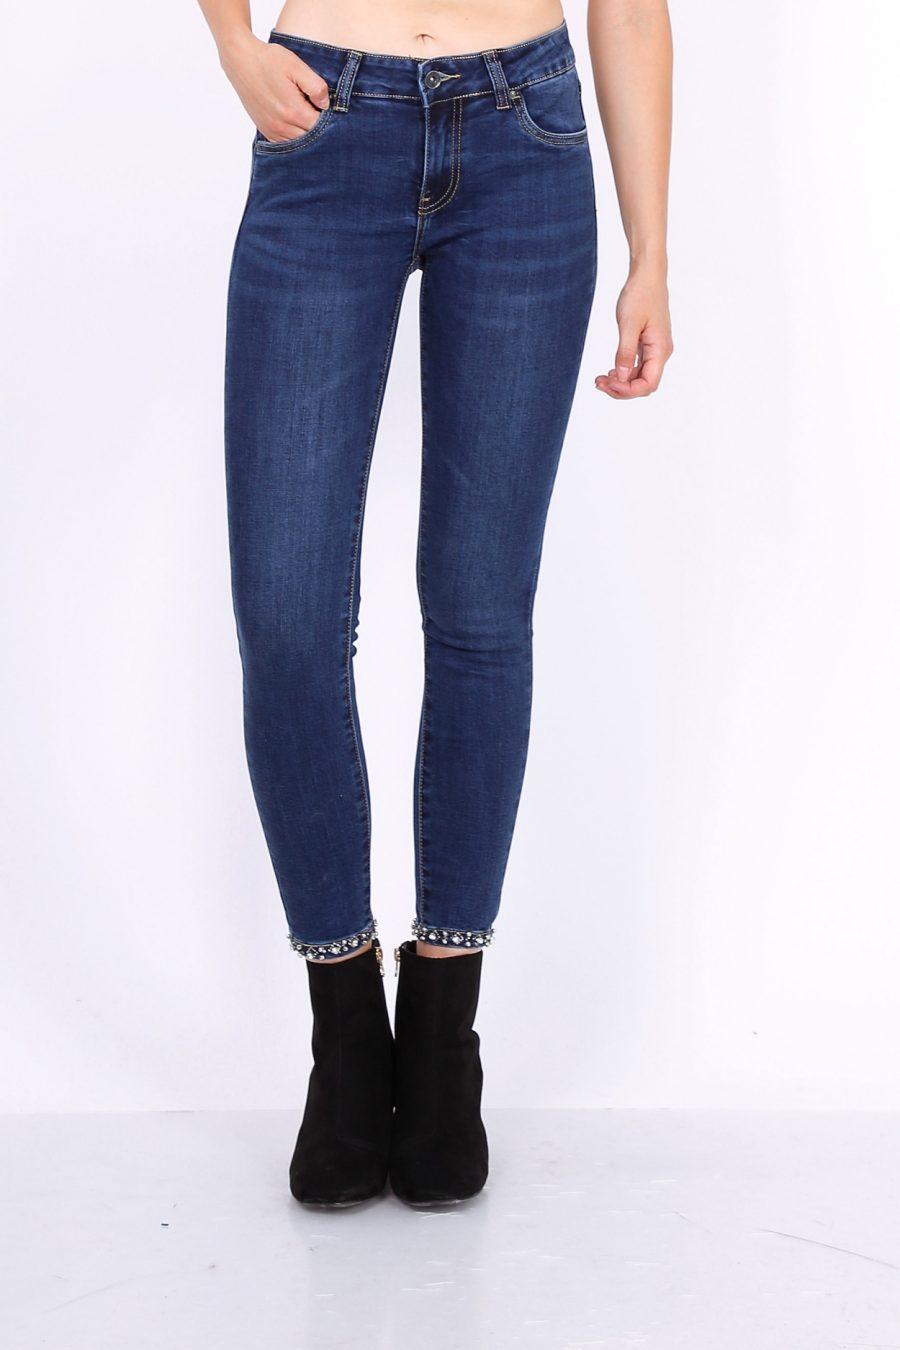 Toxik jeans donker met strik